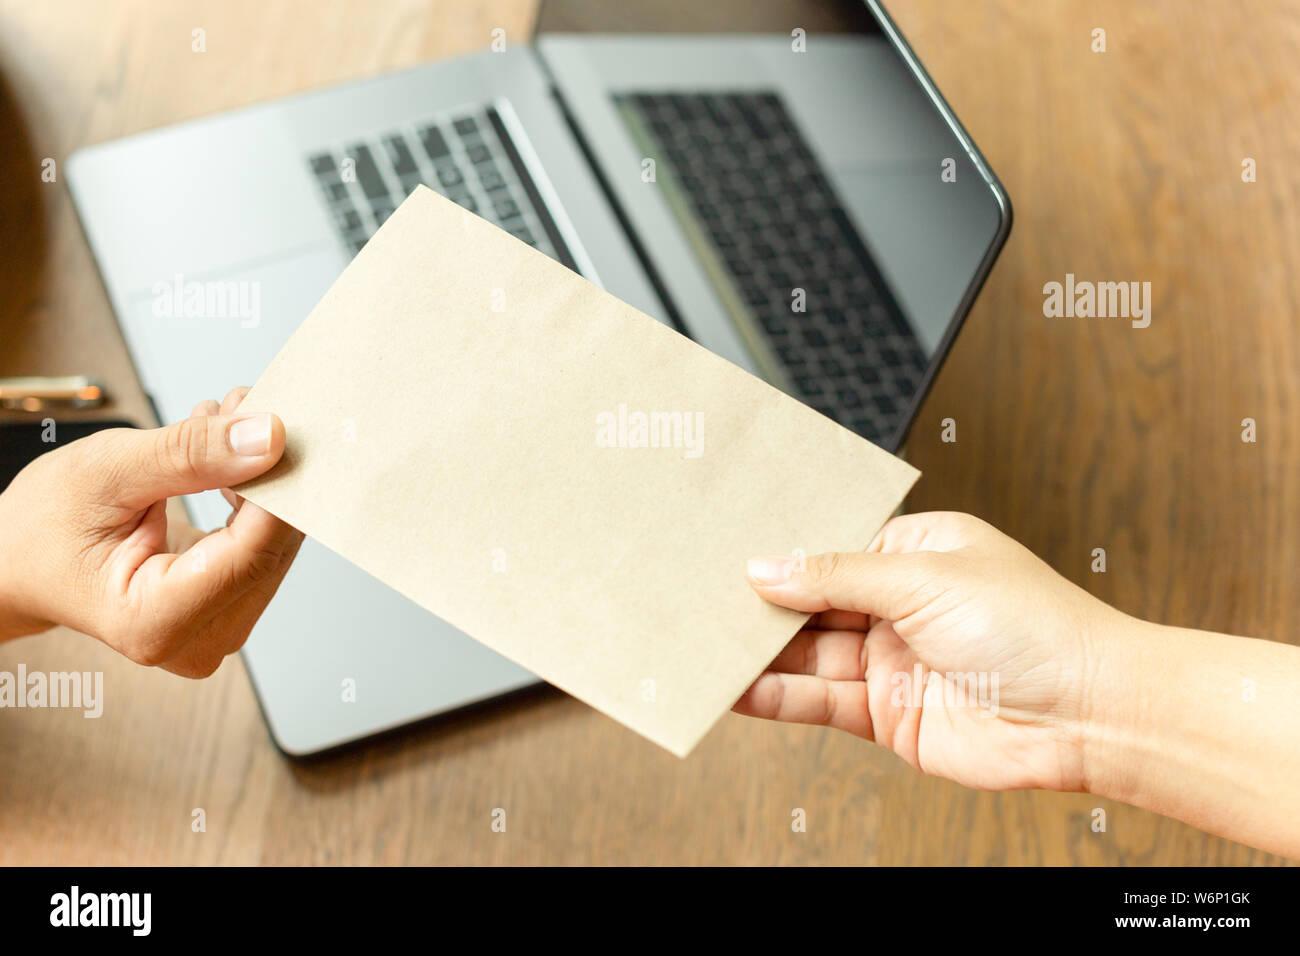 Businessman taking bribe money in brown envelope from partner. Stock Photo